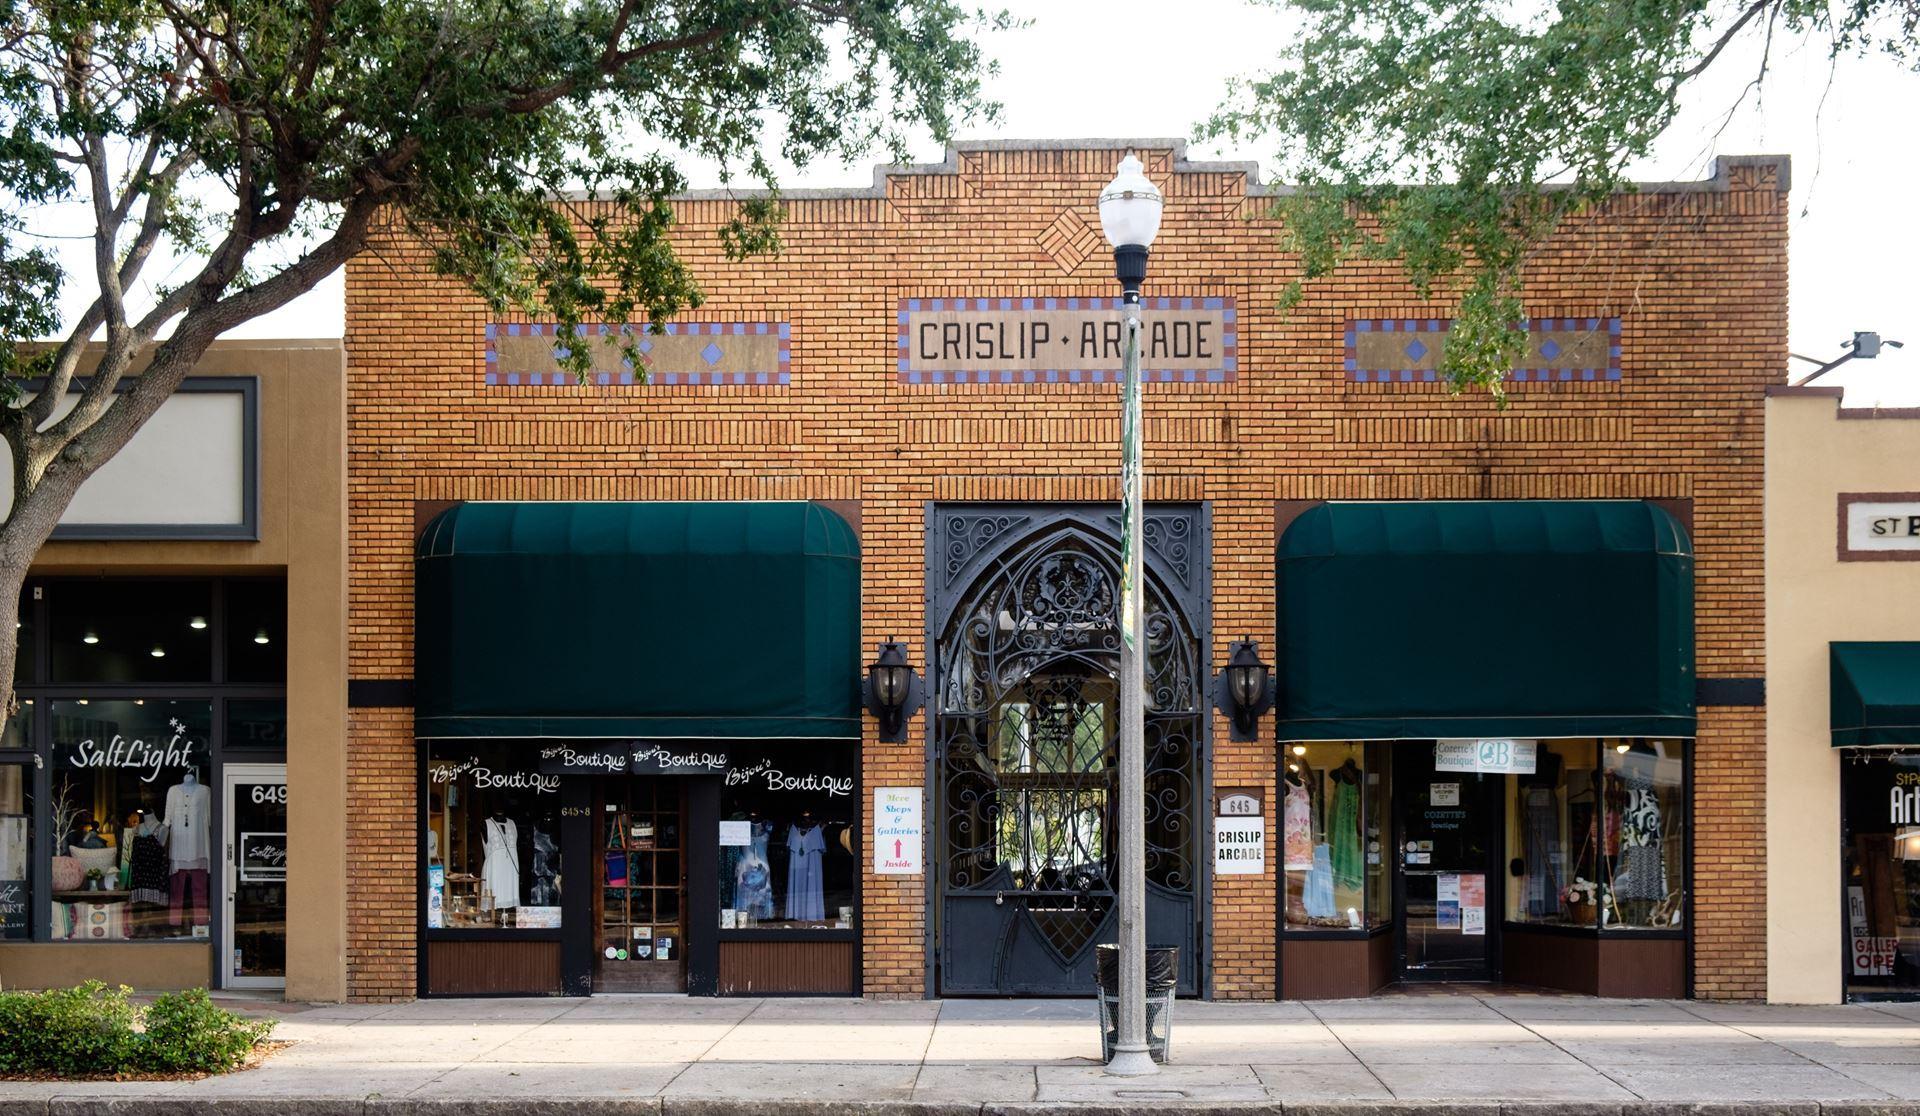 Storefront of Crislip Arcade